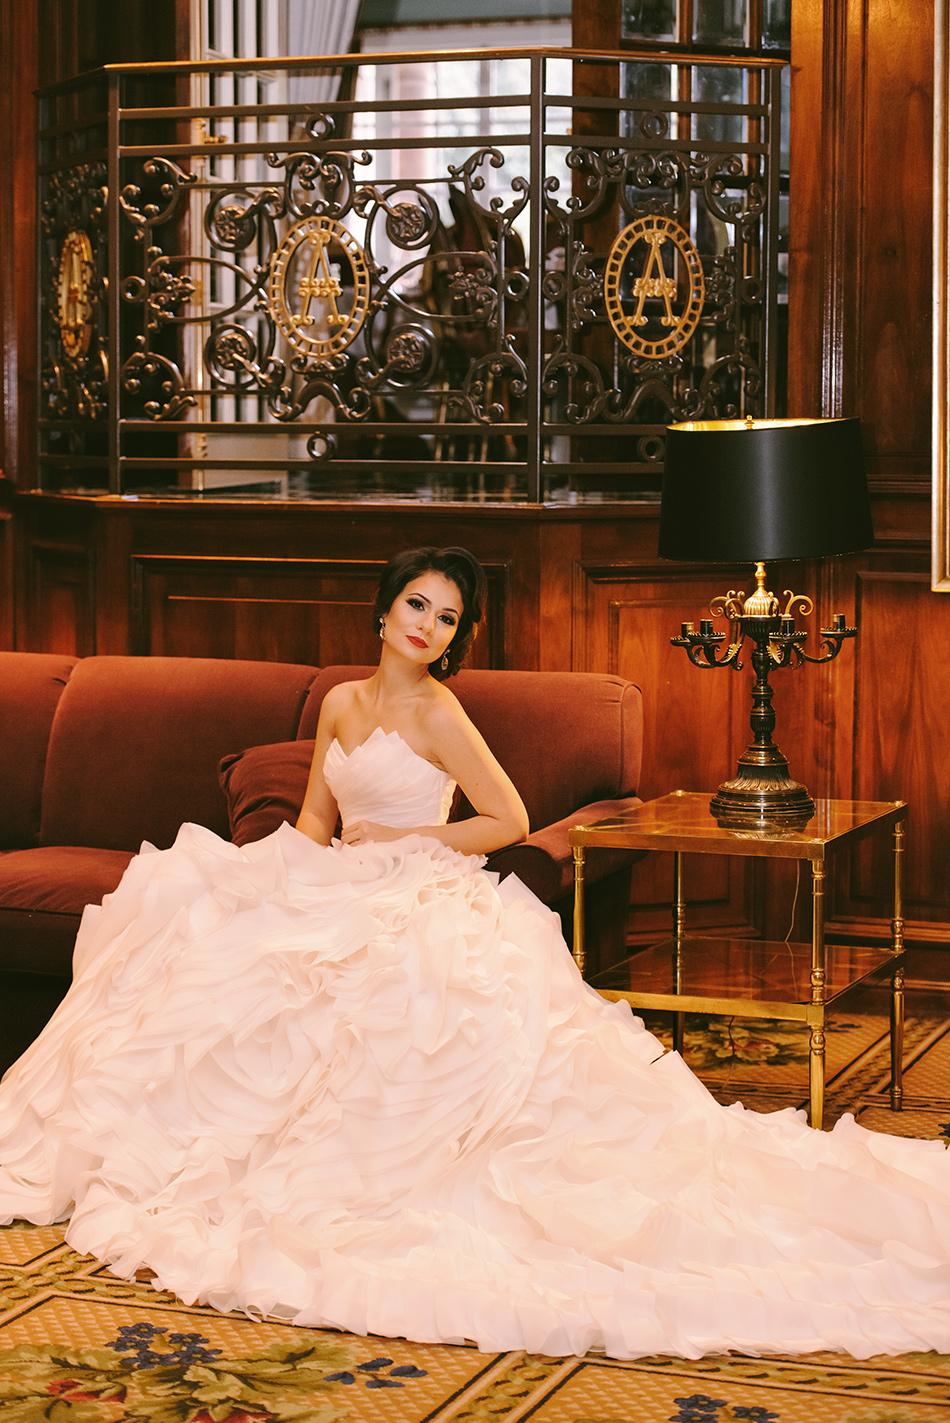 AD Passion Photography | stephany-and-nathan-wedding-dallas_048 | Adelin, Dida, fotograf profesionist, fotograf de nunta, fotografie de nunta, fotograf Timisoara, fotograf Craiova, fotograf Bucuresti, fotograf Arad, nunta Timisoara, nunta Arad, nunta Bucuresti, nunta Craiova